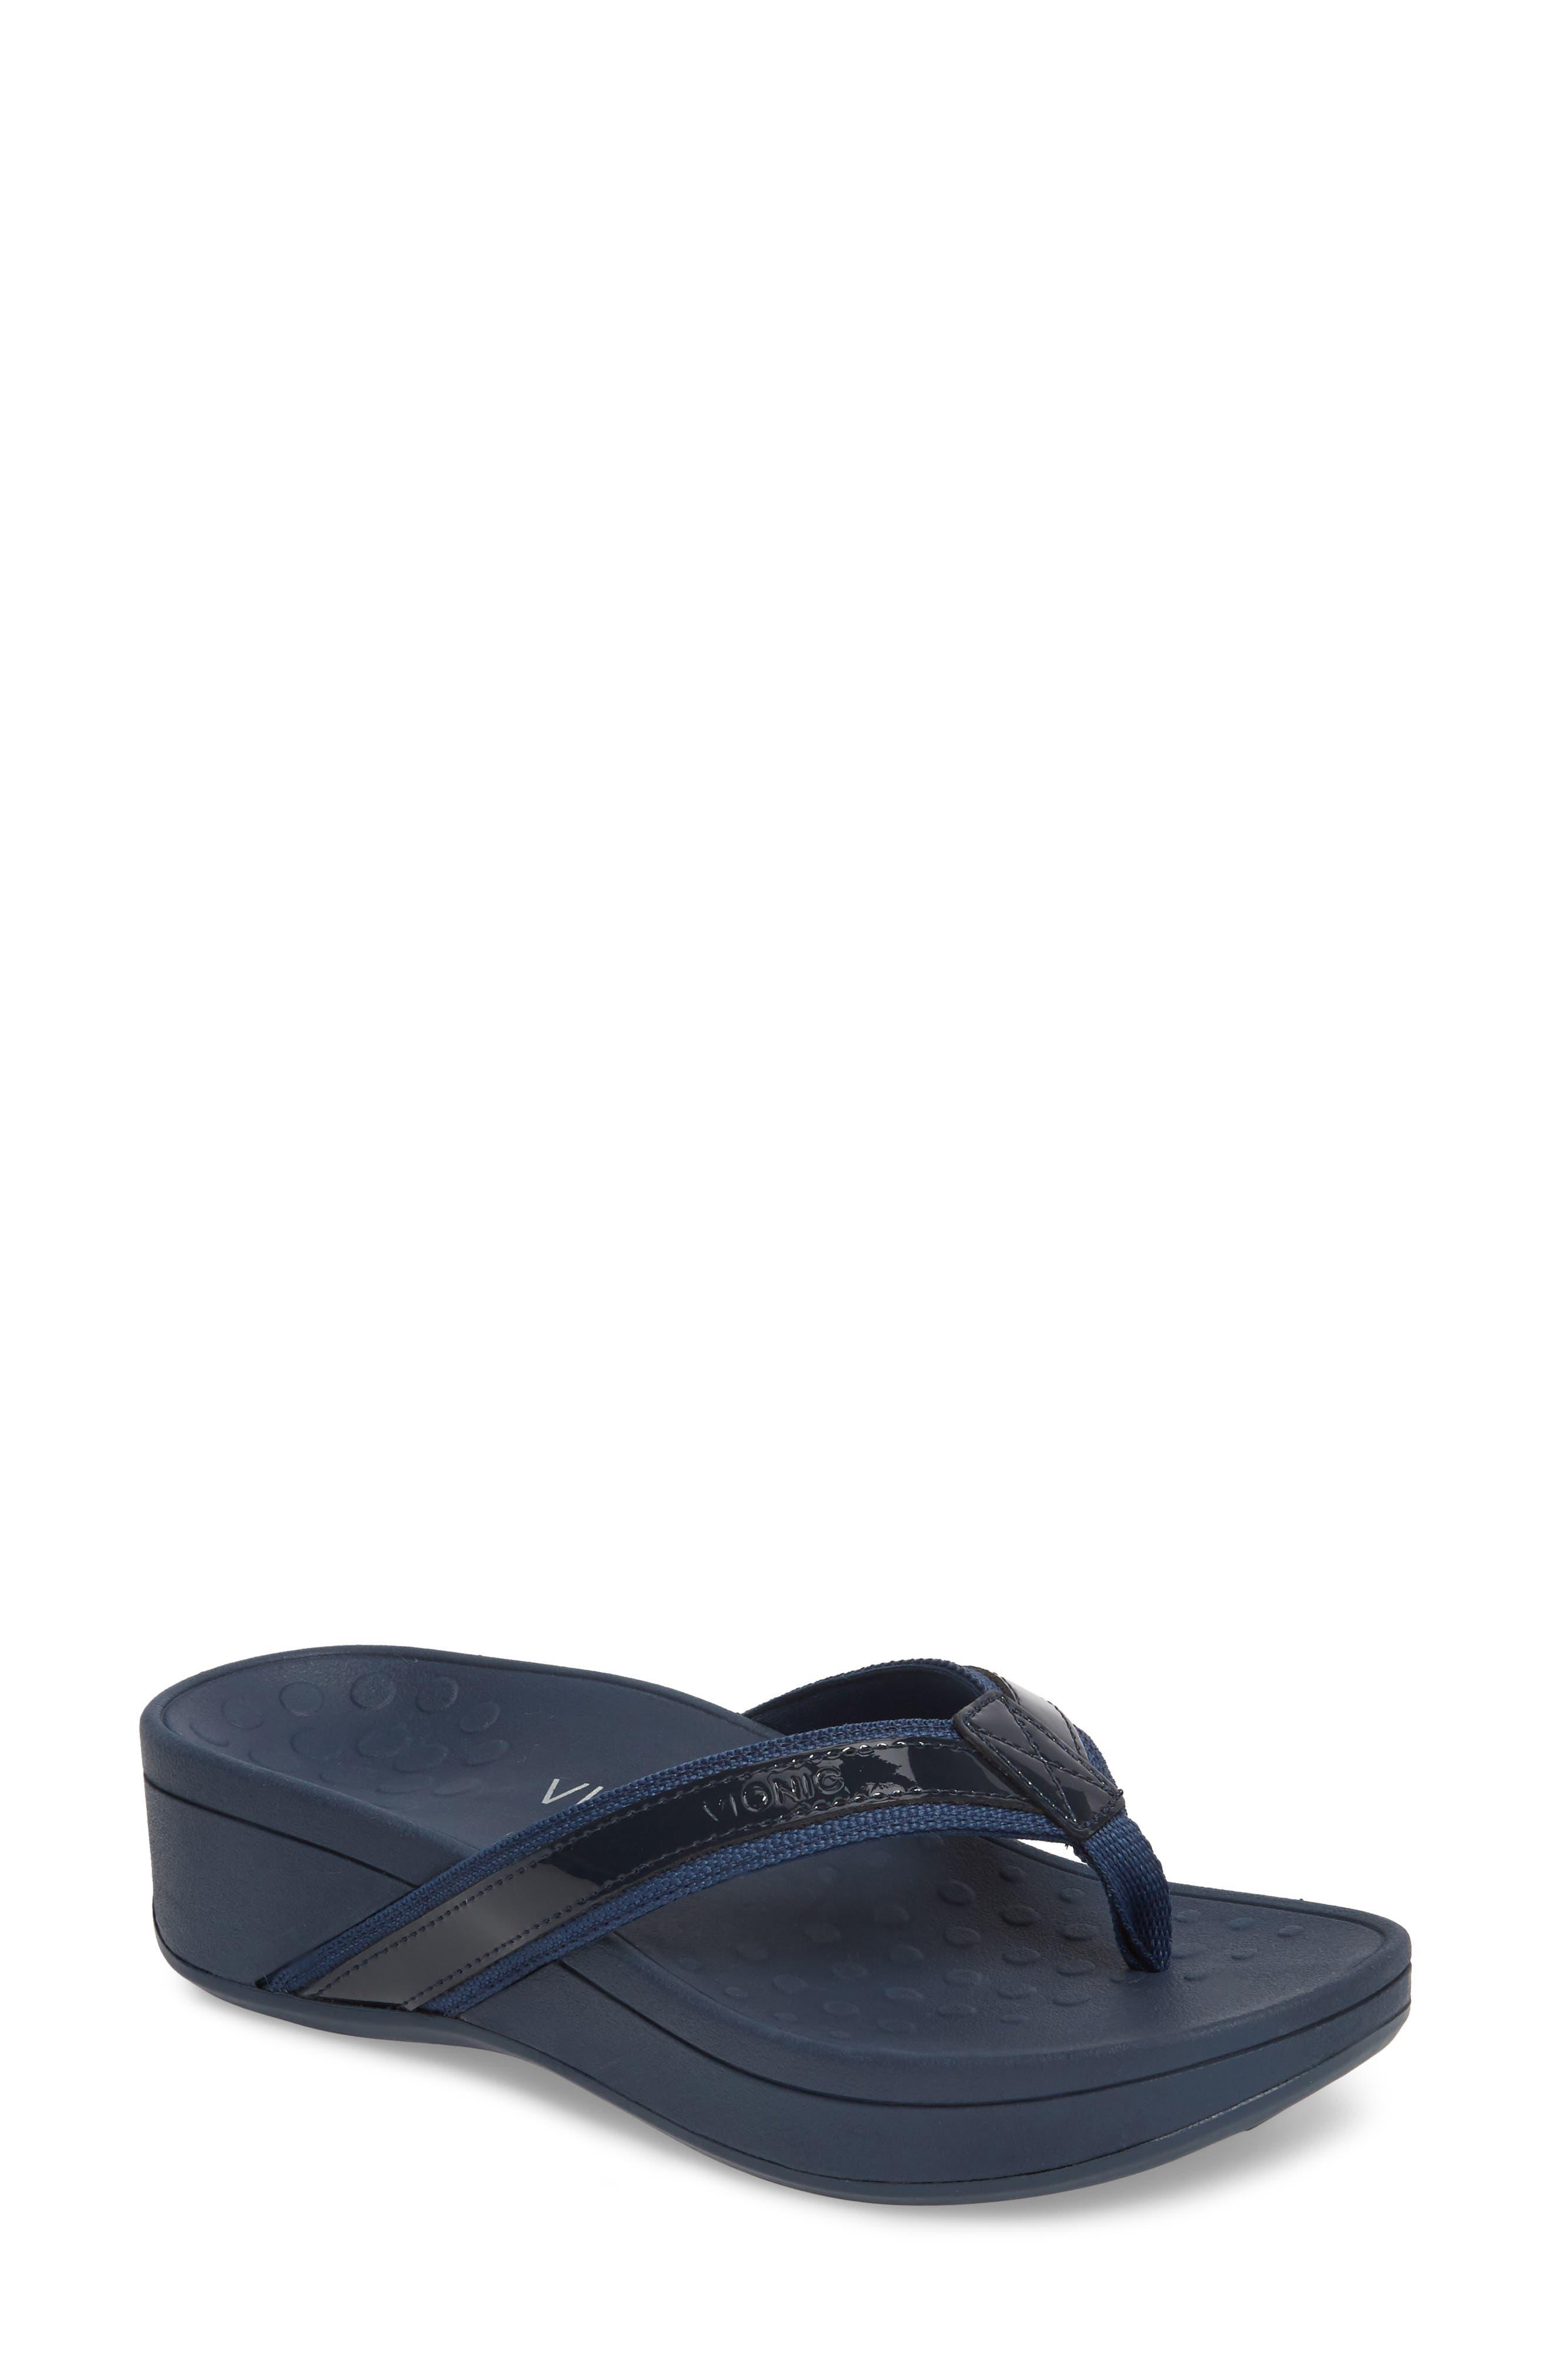 2062bd71dae5 Women s Vionic Comfortable Sandals